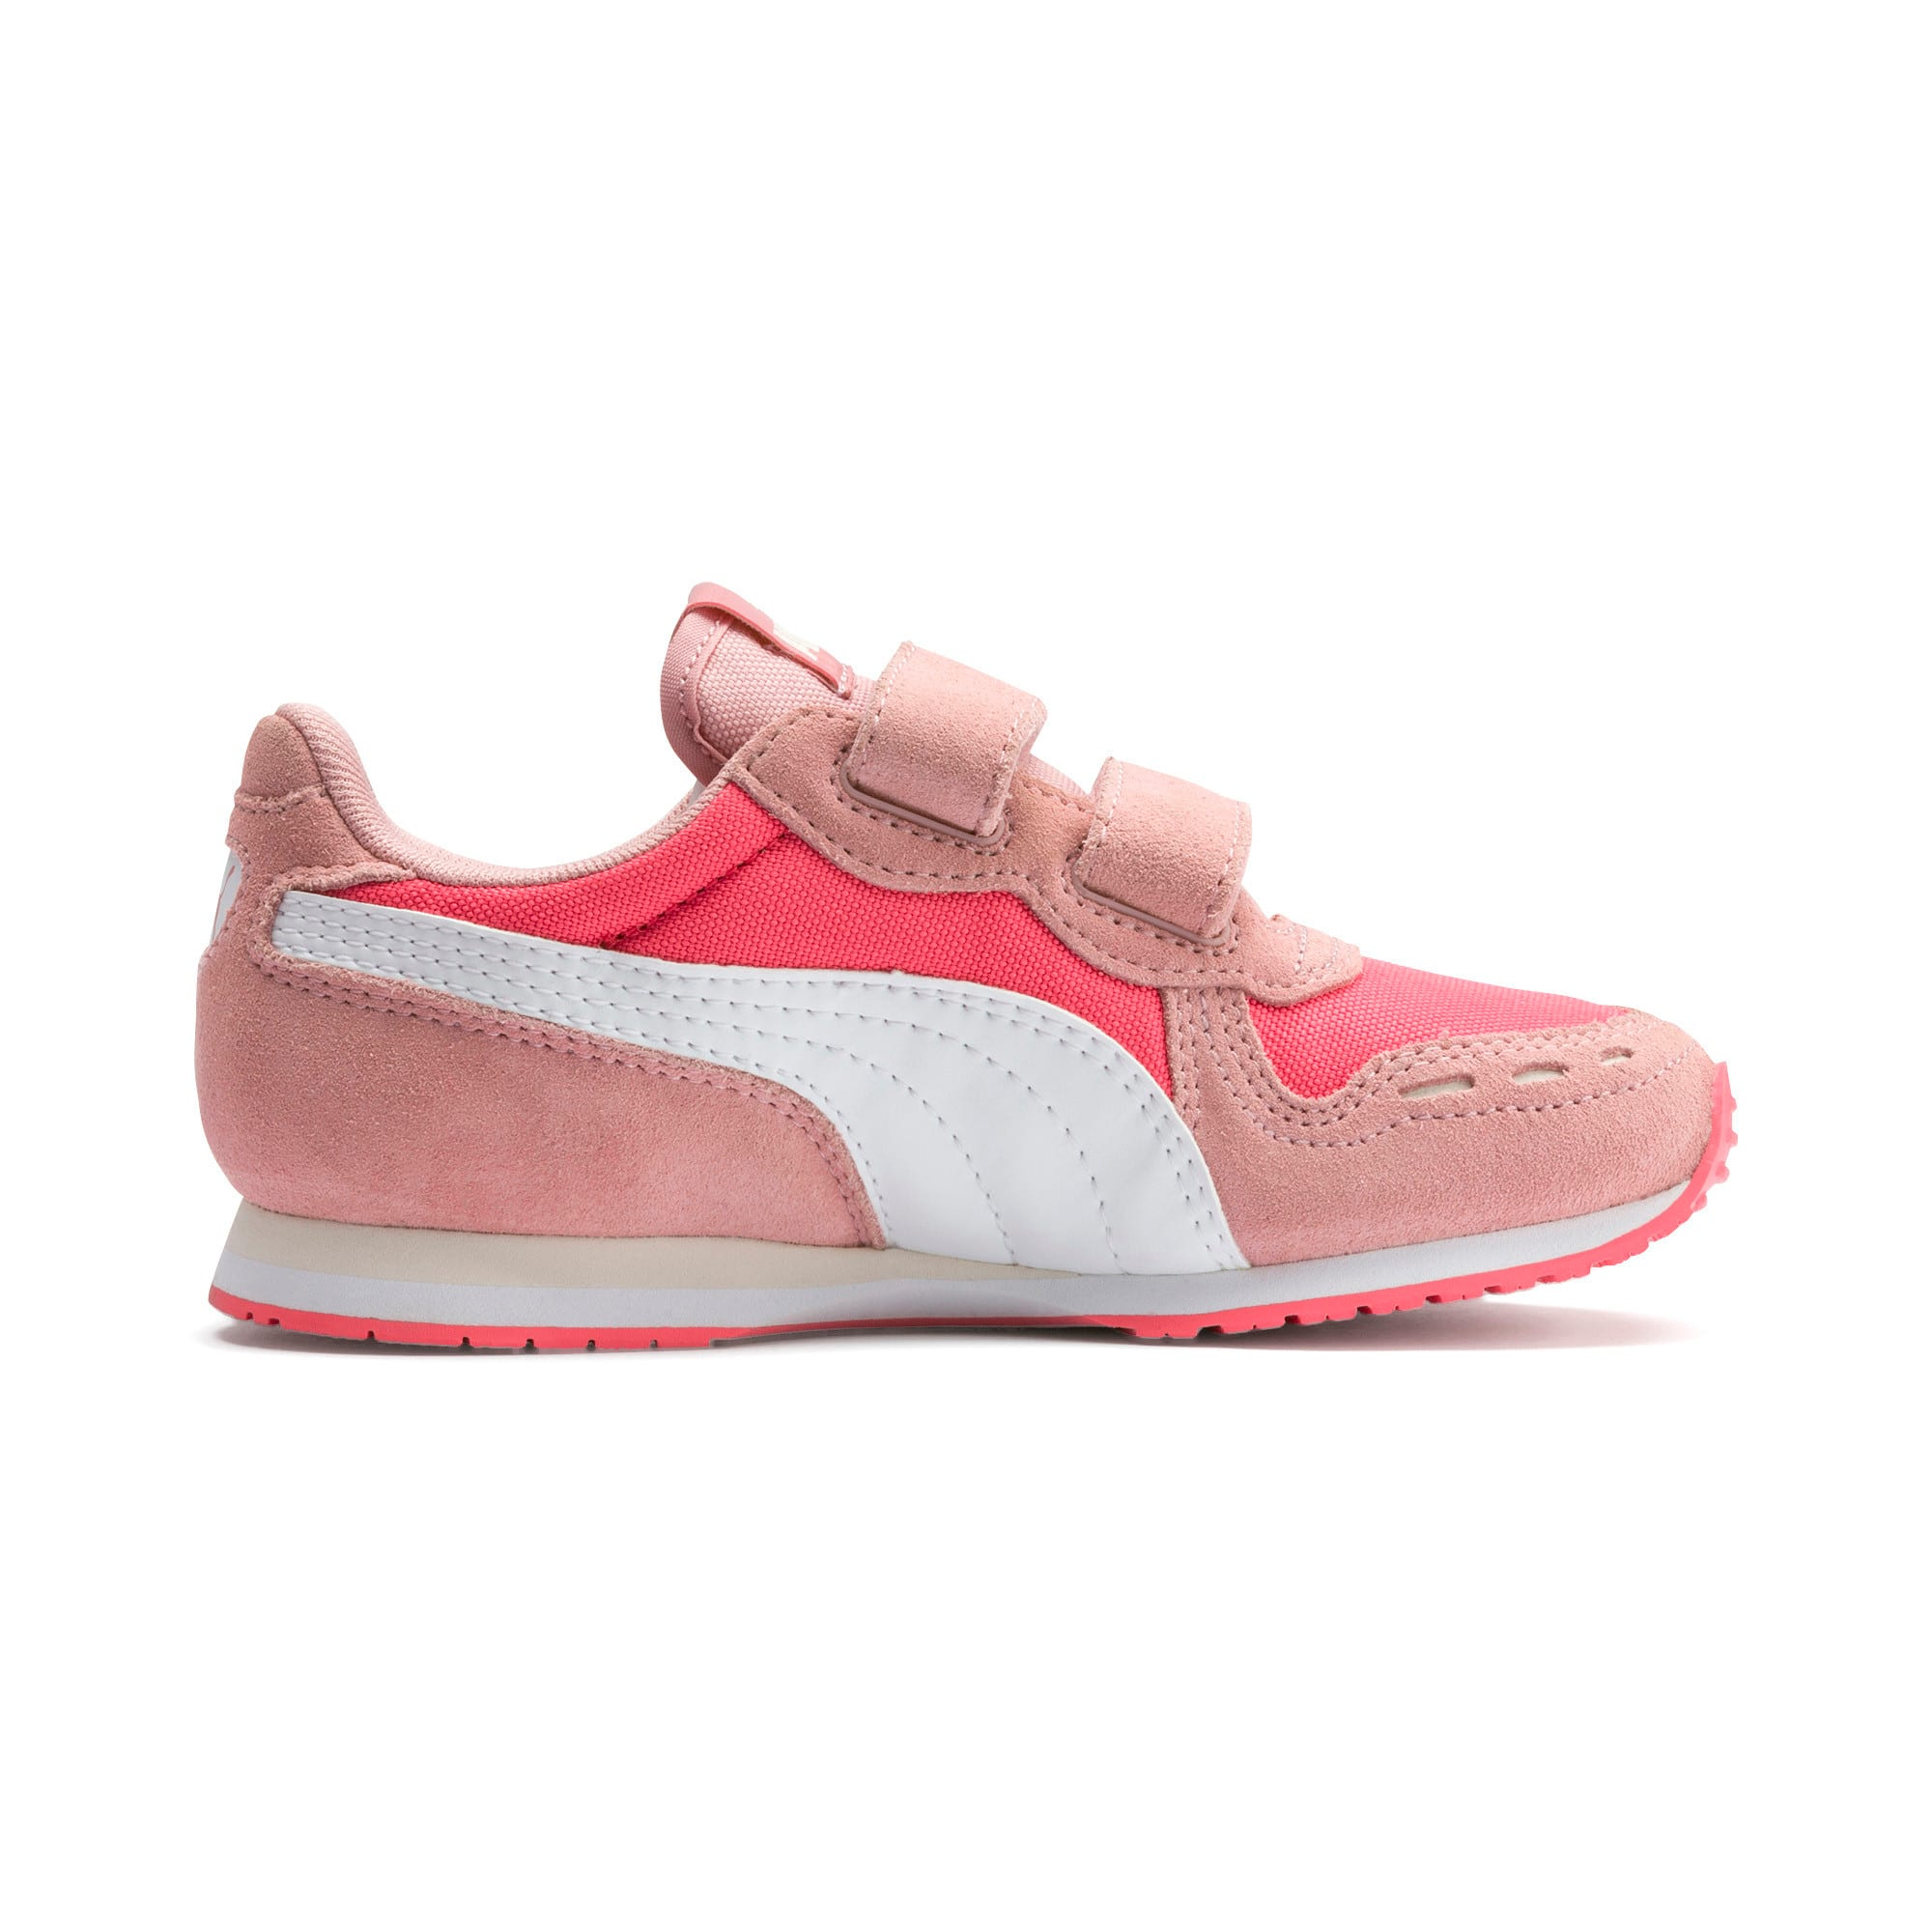 Miniatura 5 de Zapatos Cabana Racer para niño pequeño, Calypso Coral-Bridal Rose, mediano